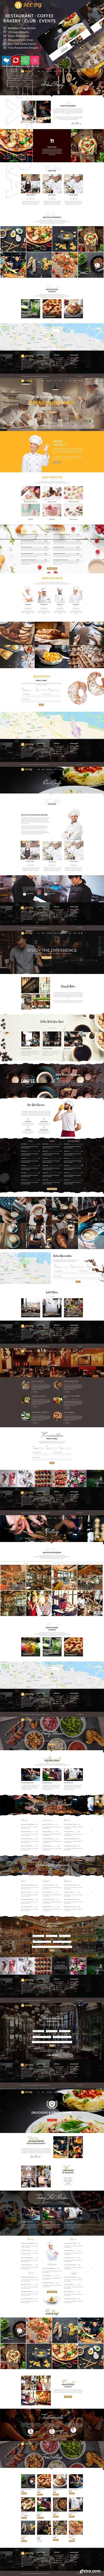 CreativeMarket - Foody - Restaurant & Coffee, Bakery 2572679